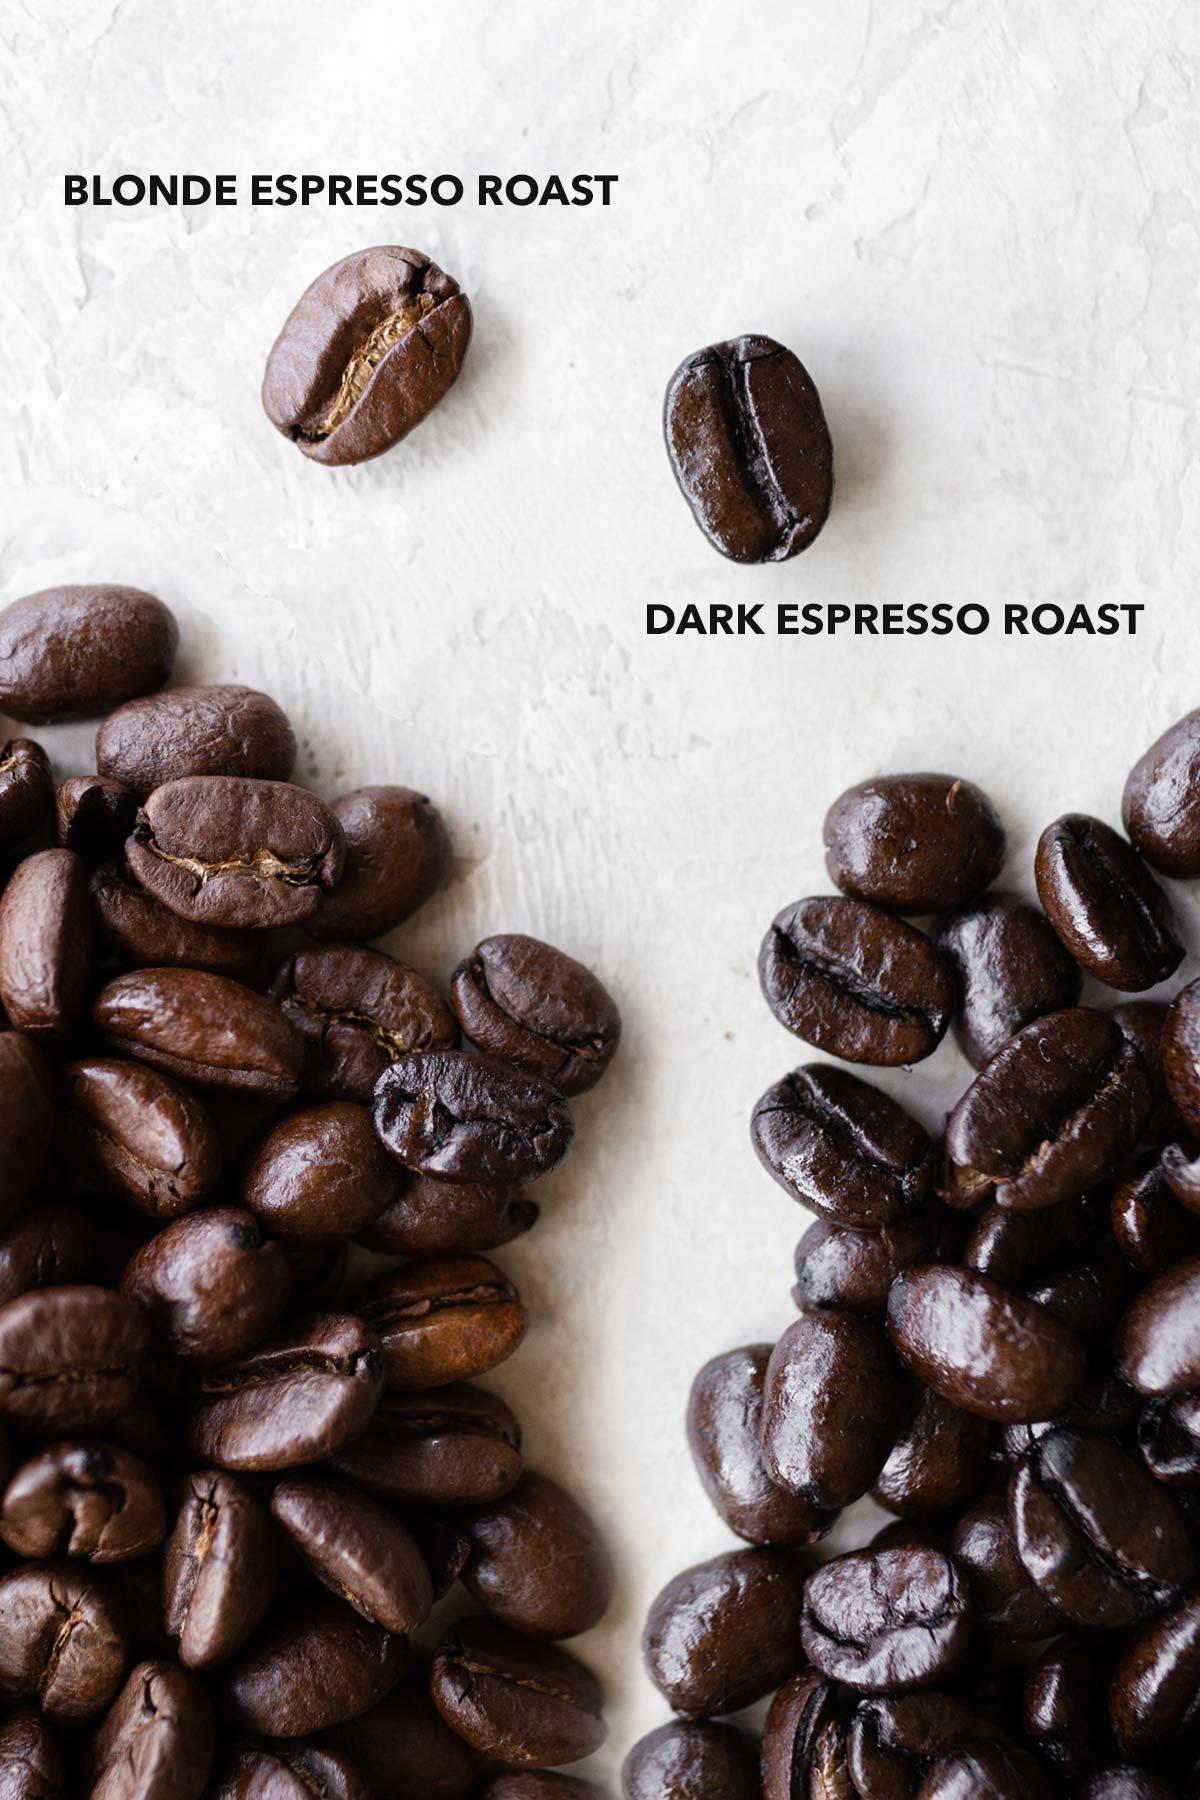 Blonde espresso roast and dark espresso roast coffee beans.